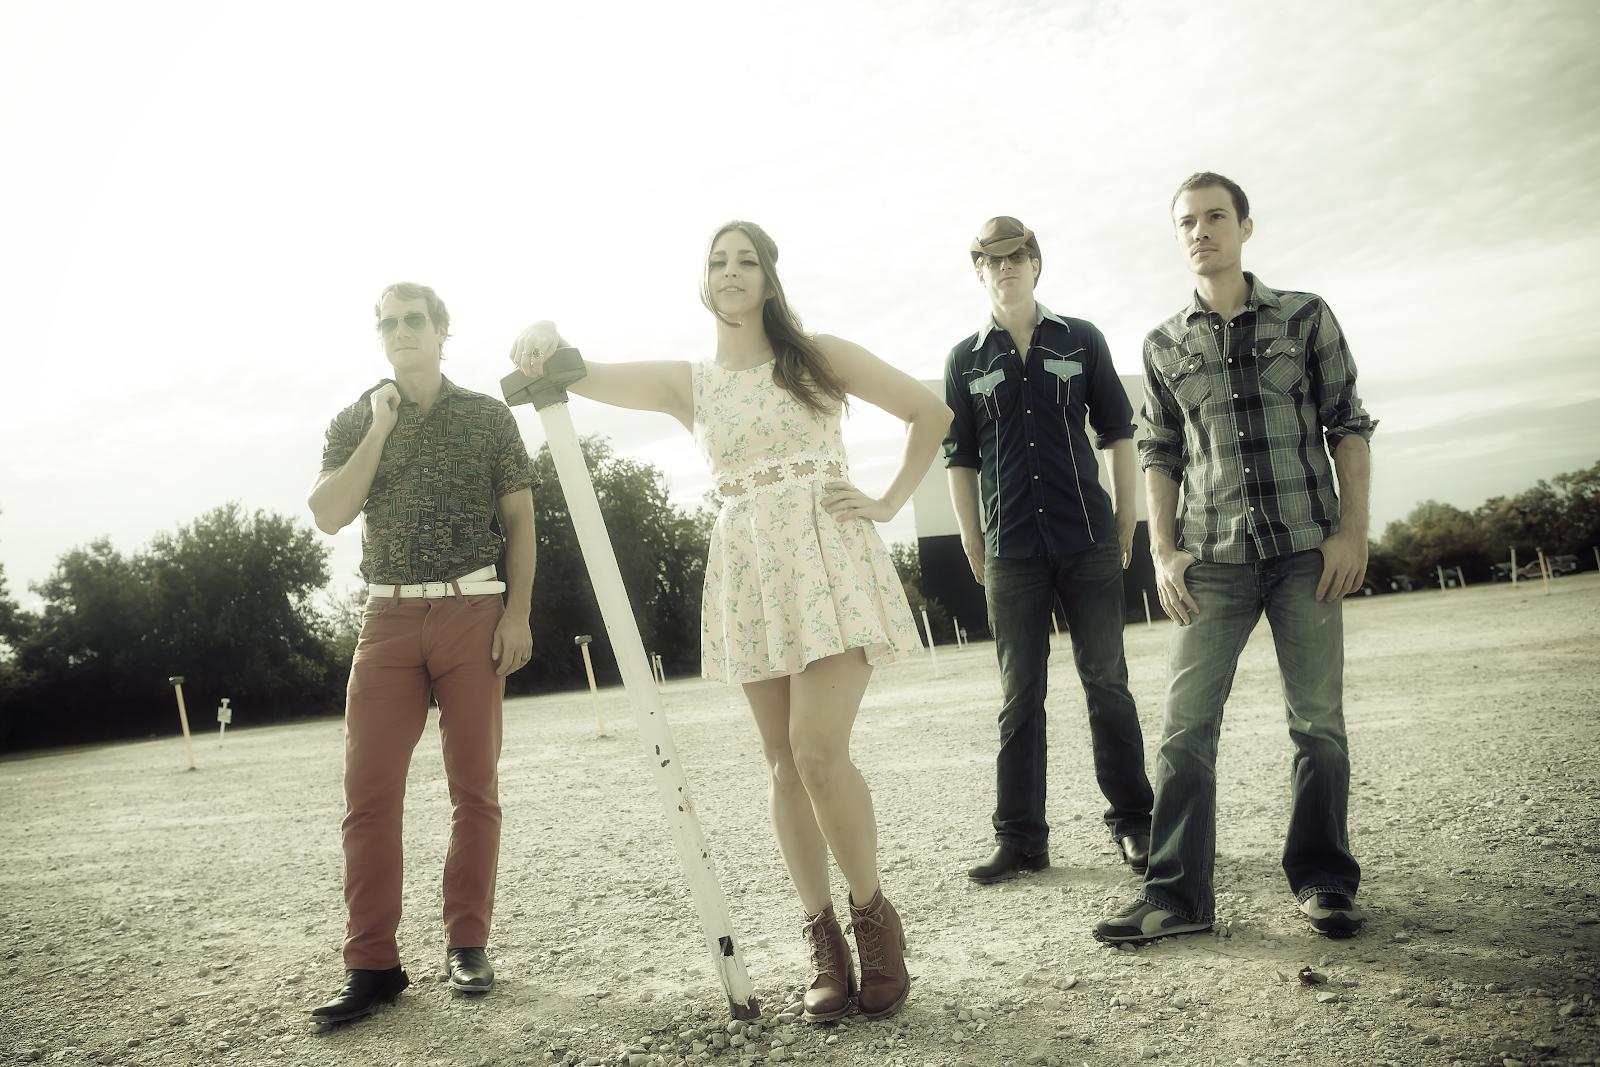 4 members of Angela Perley & The Howlin' Moons standing in field